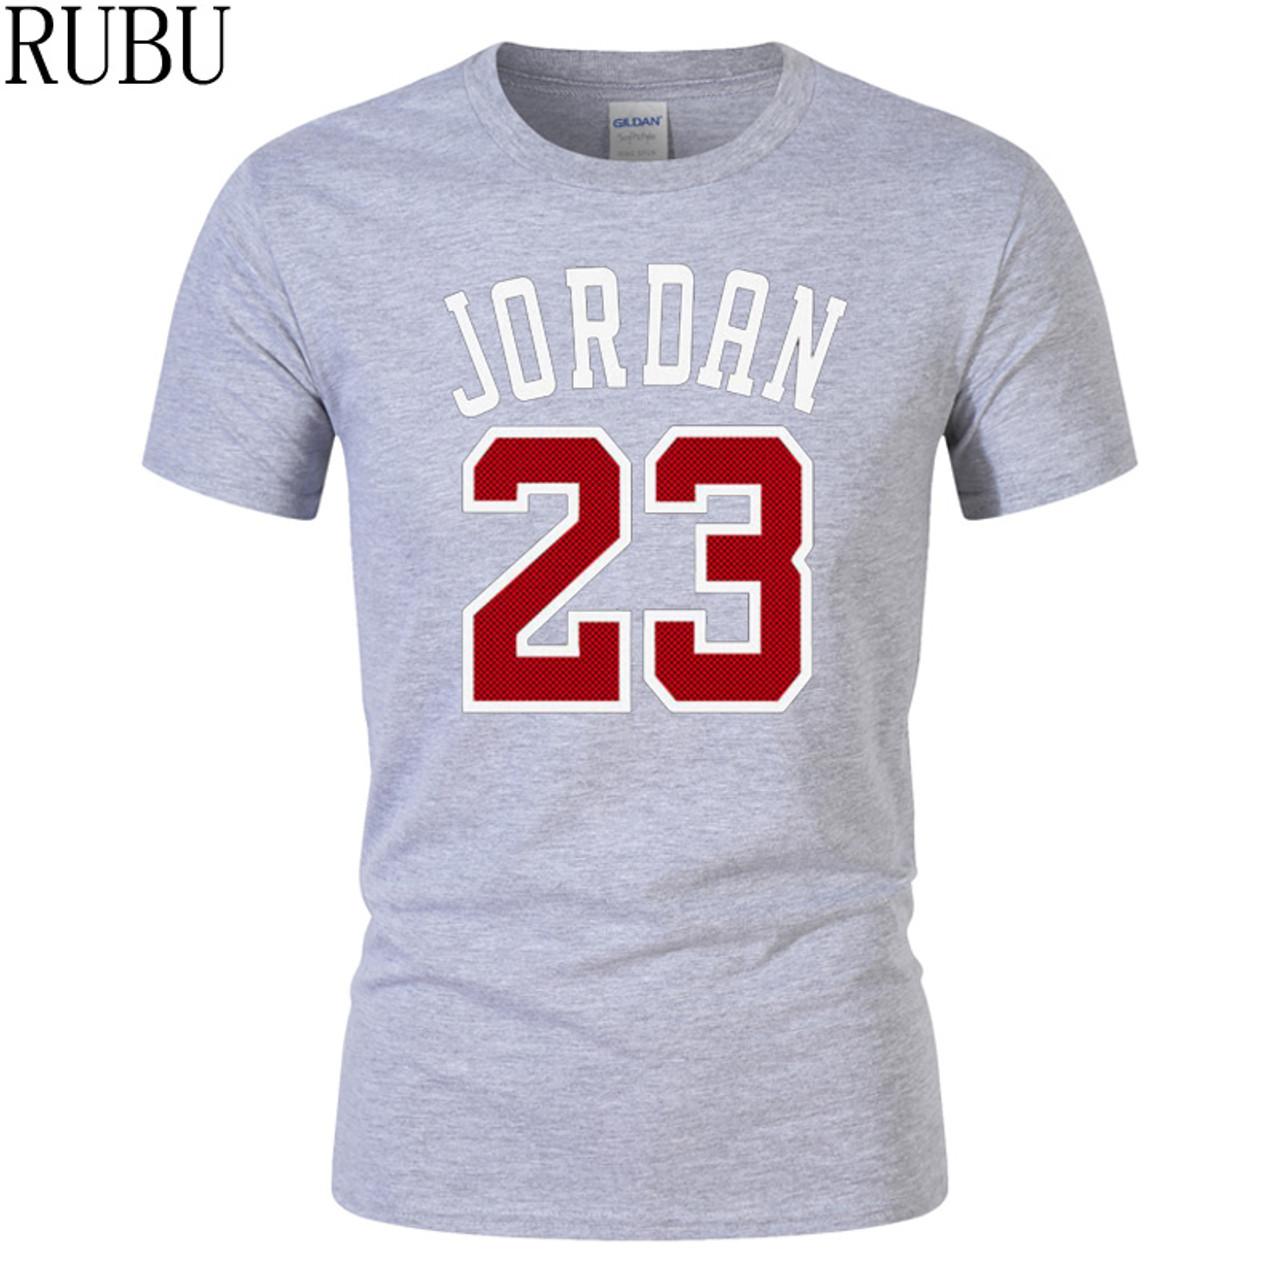 b4d51c30e2 ... RUBU summer Hot Sale New Tee Jordan 23 Print Men Swag T-Shirt Top  Quality ...